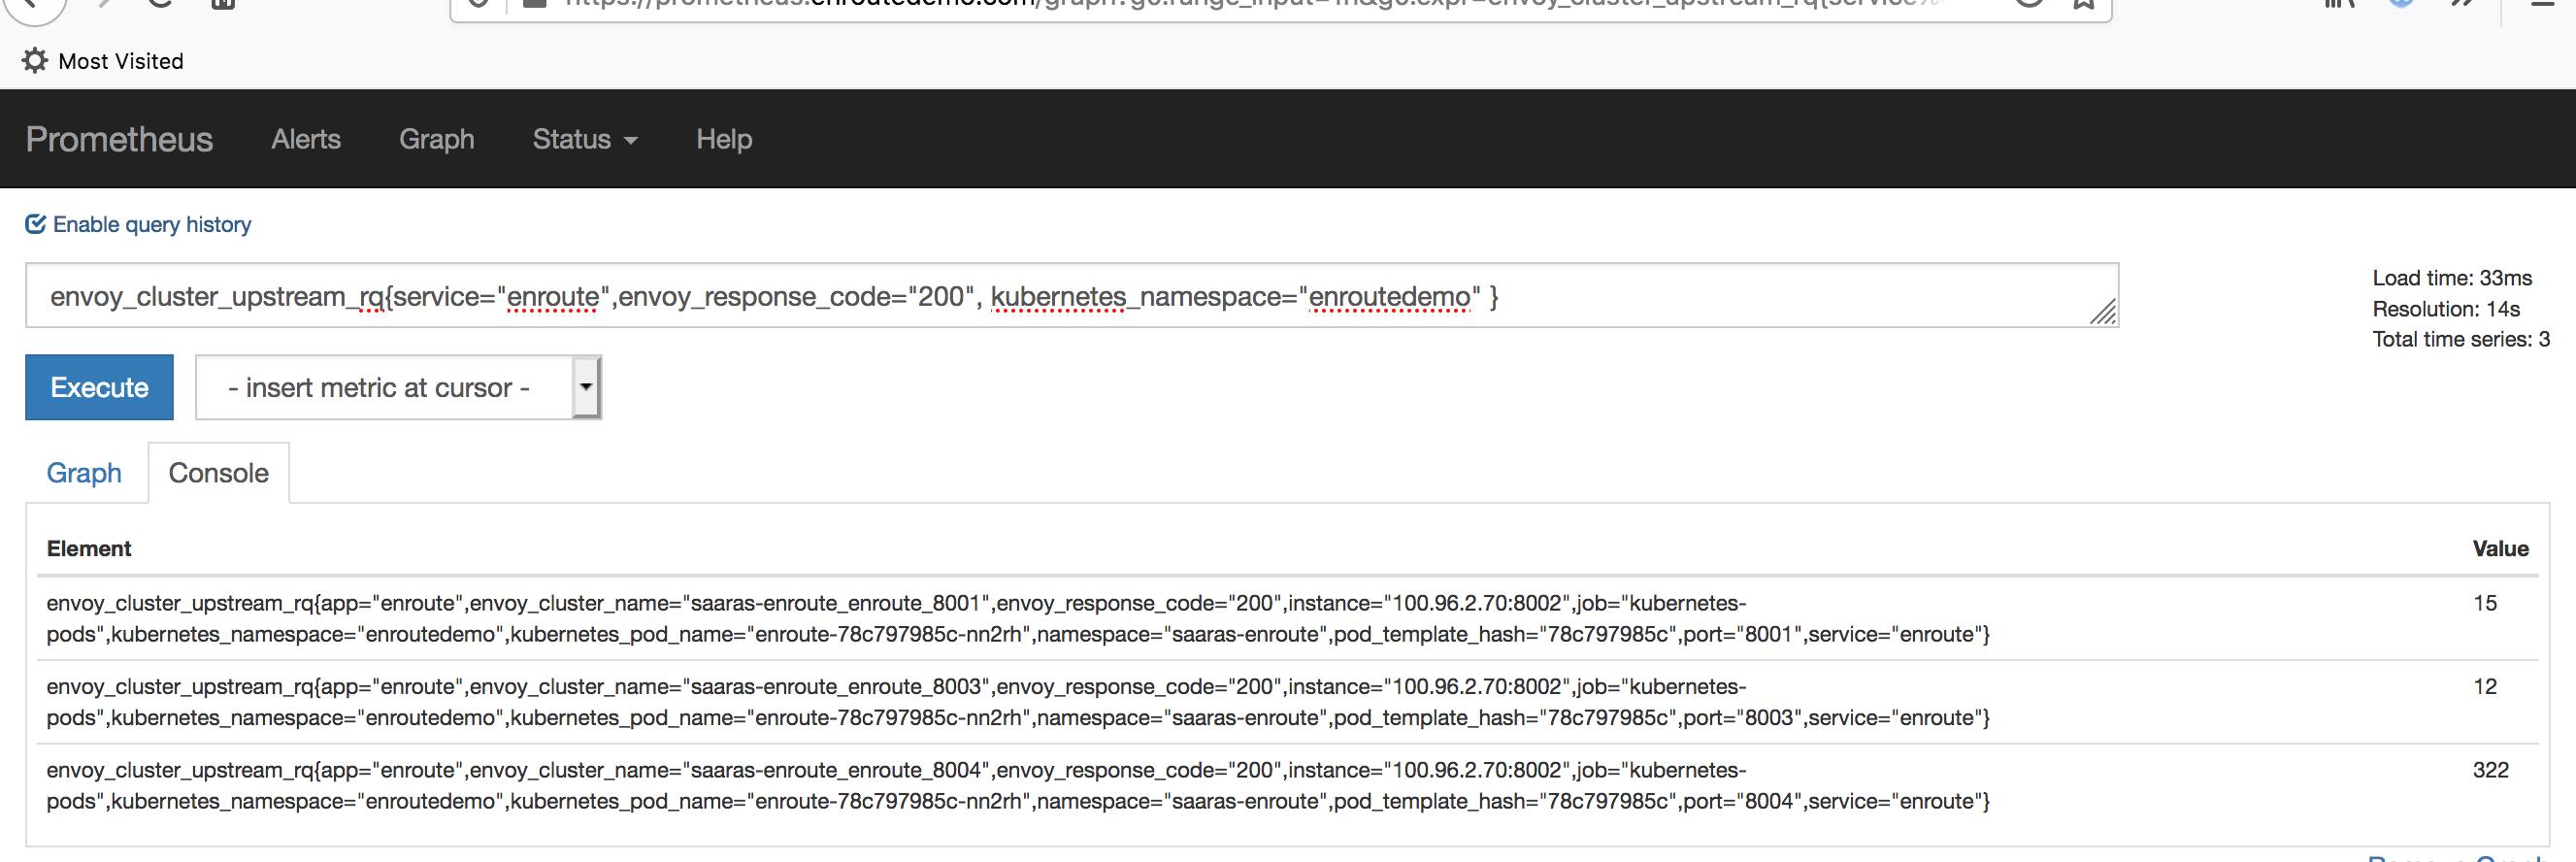 prometheus grafana query enroute service return code 200